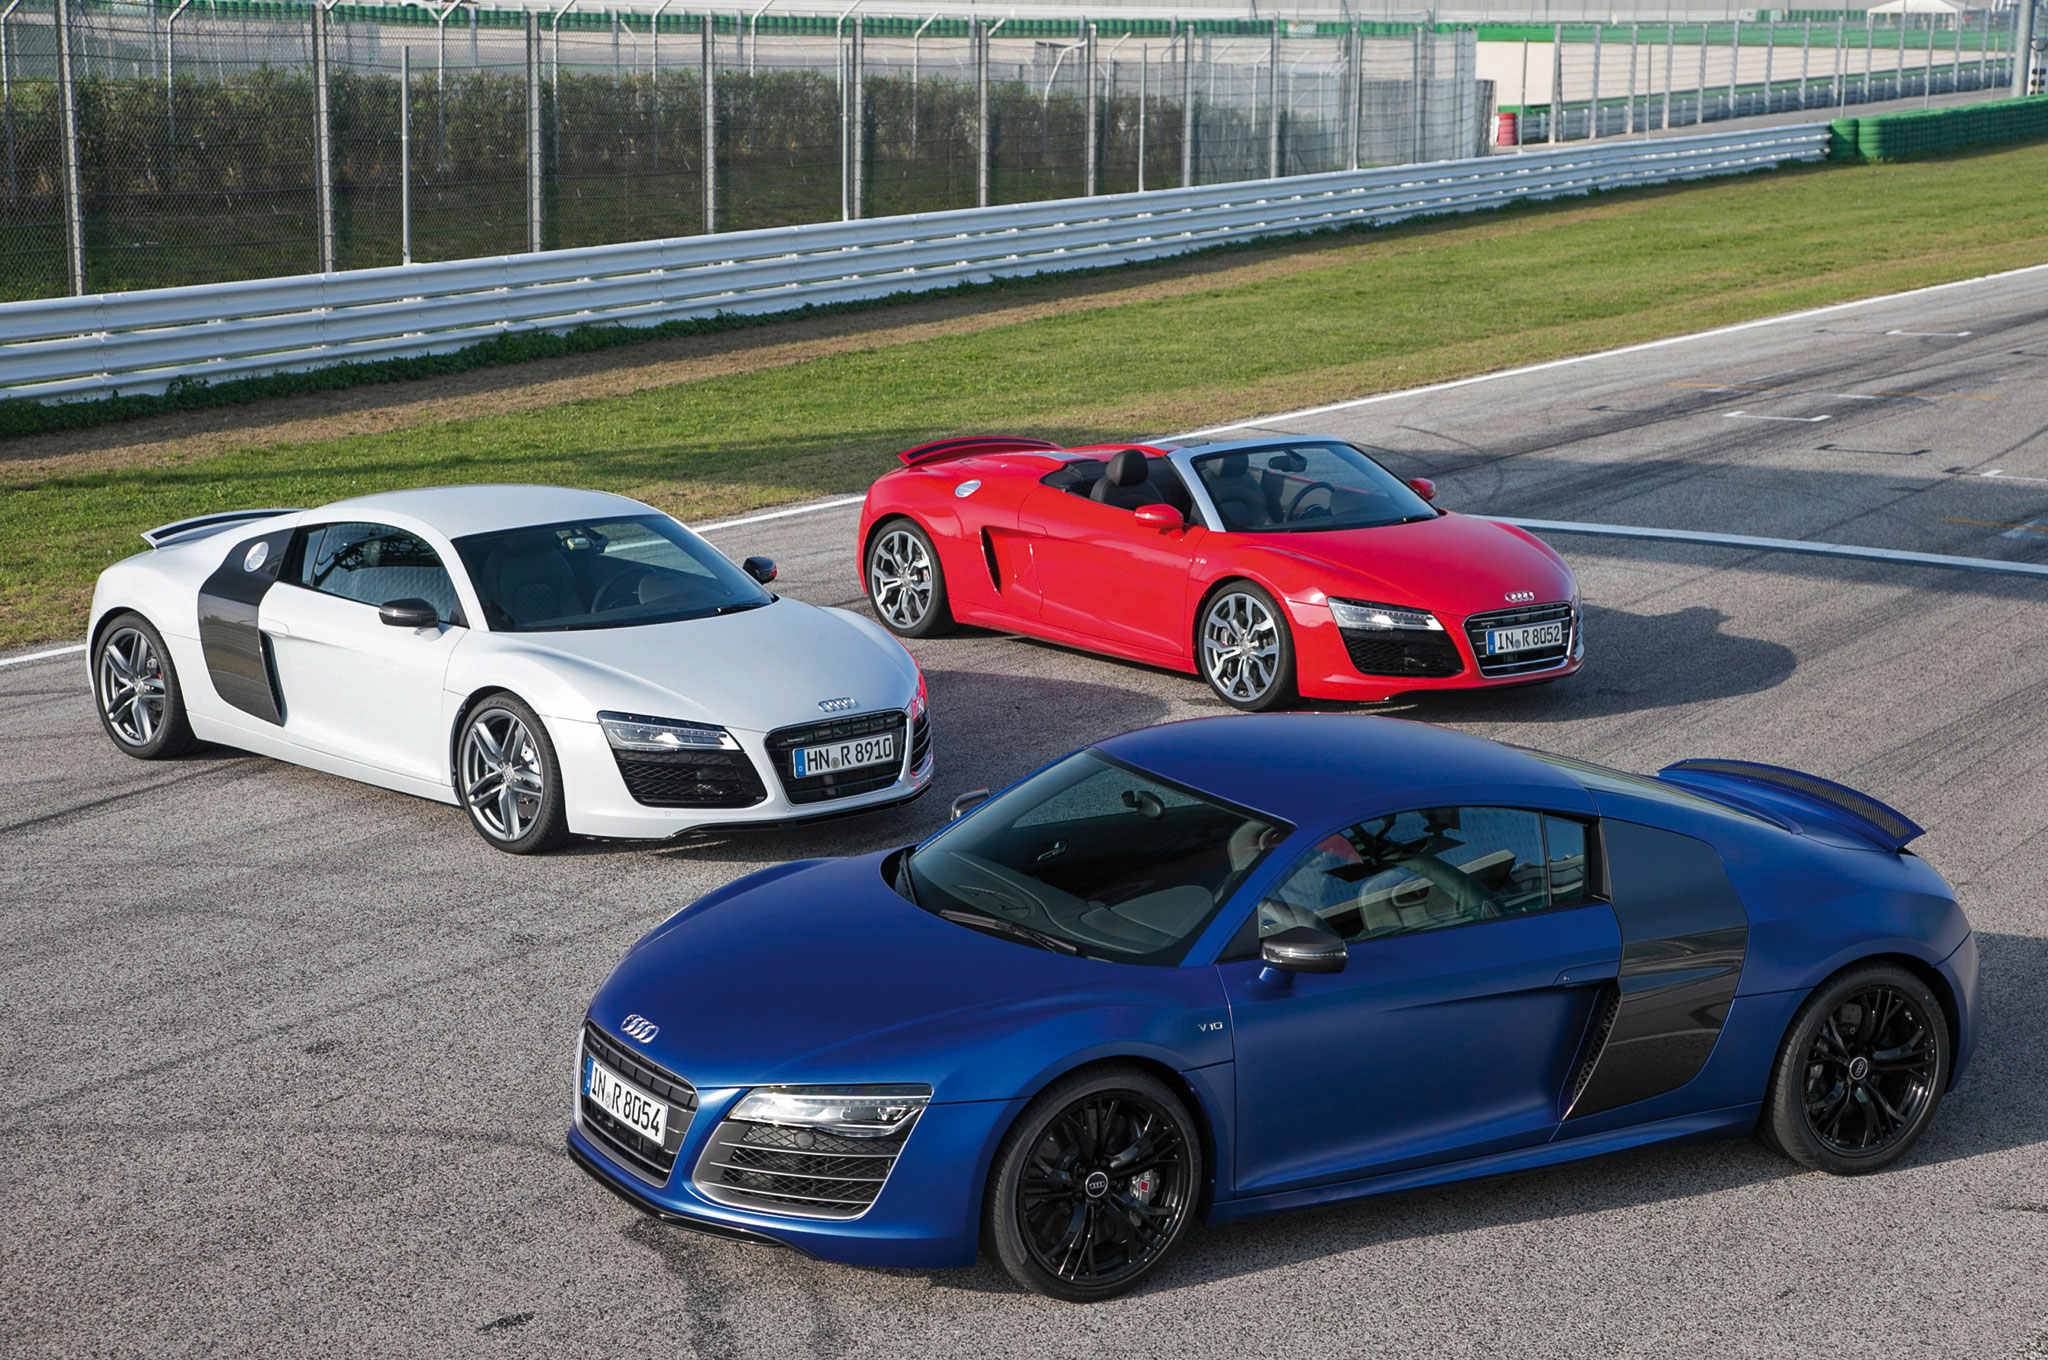 2014 Audi R8 Group1